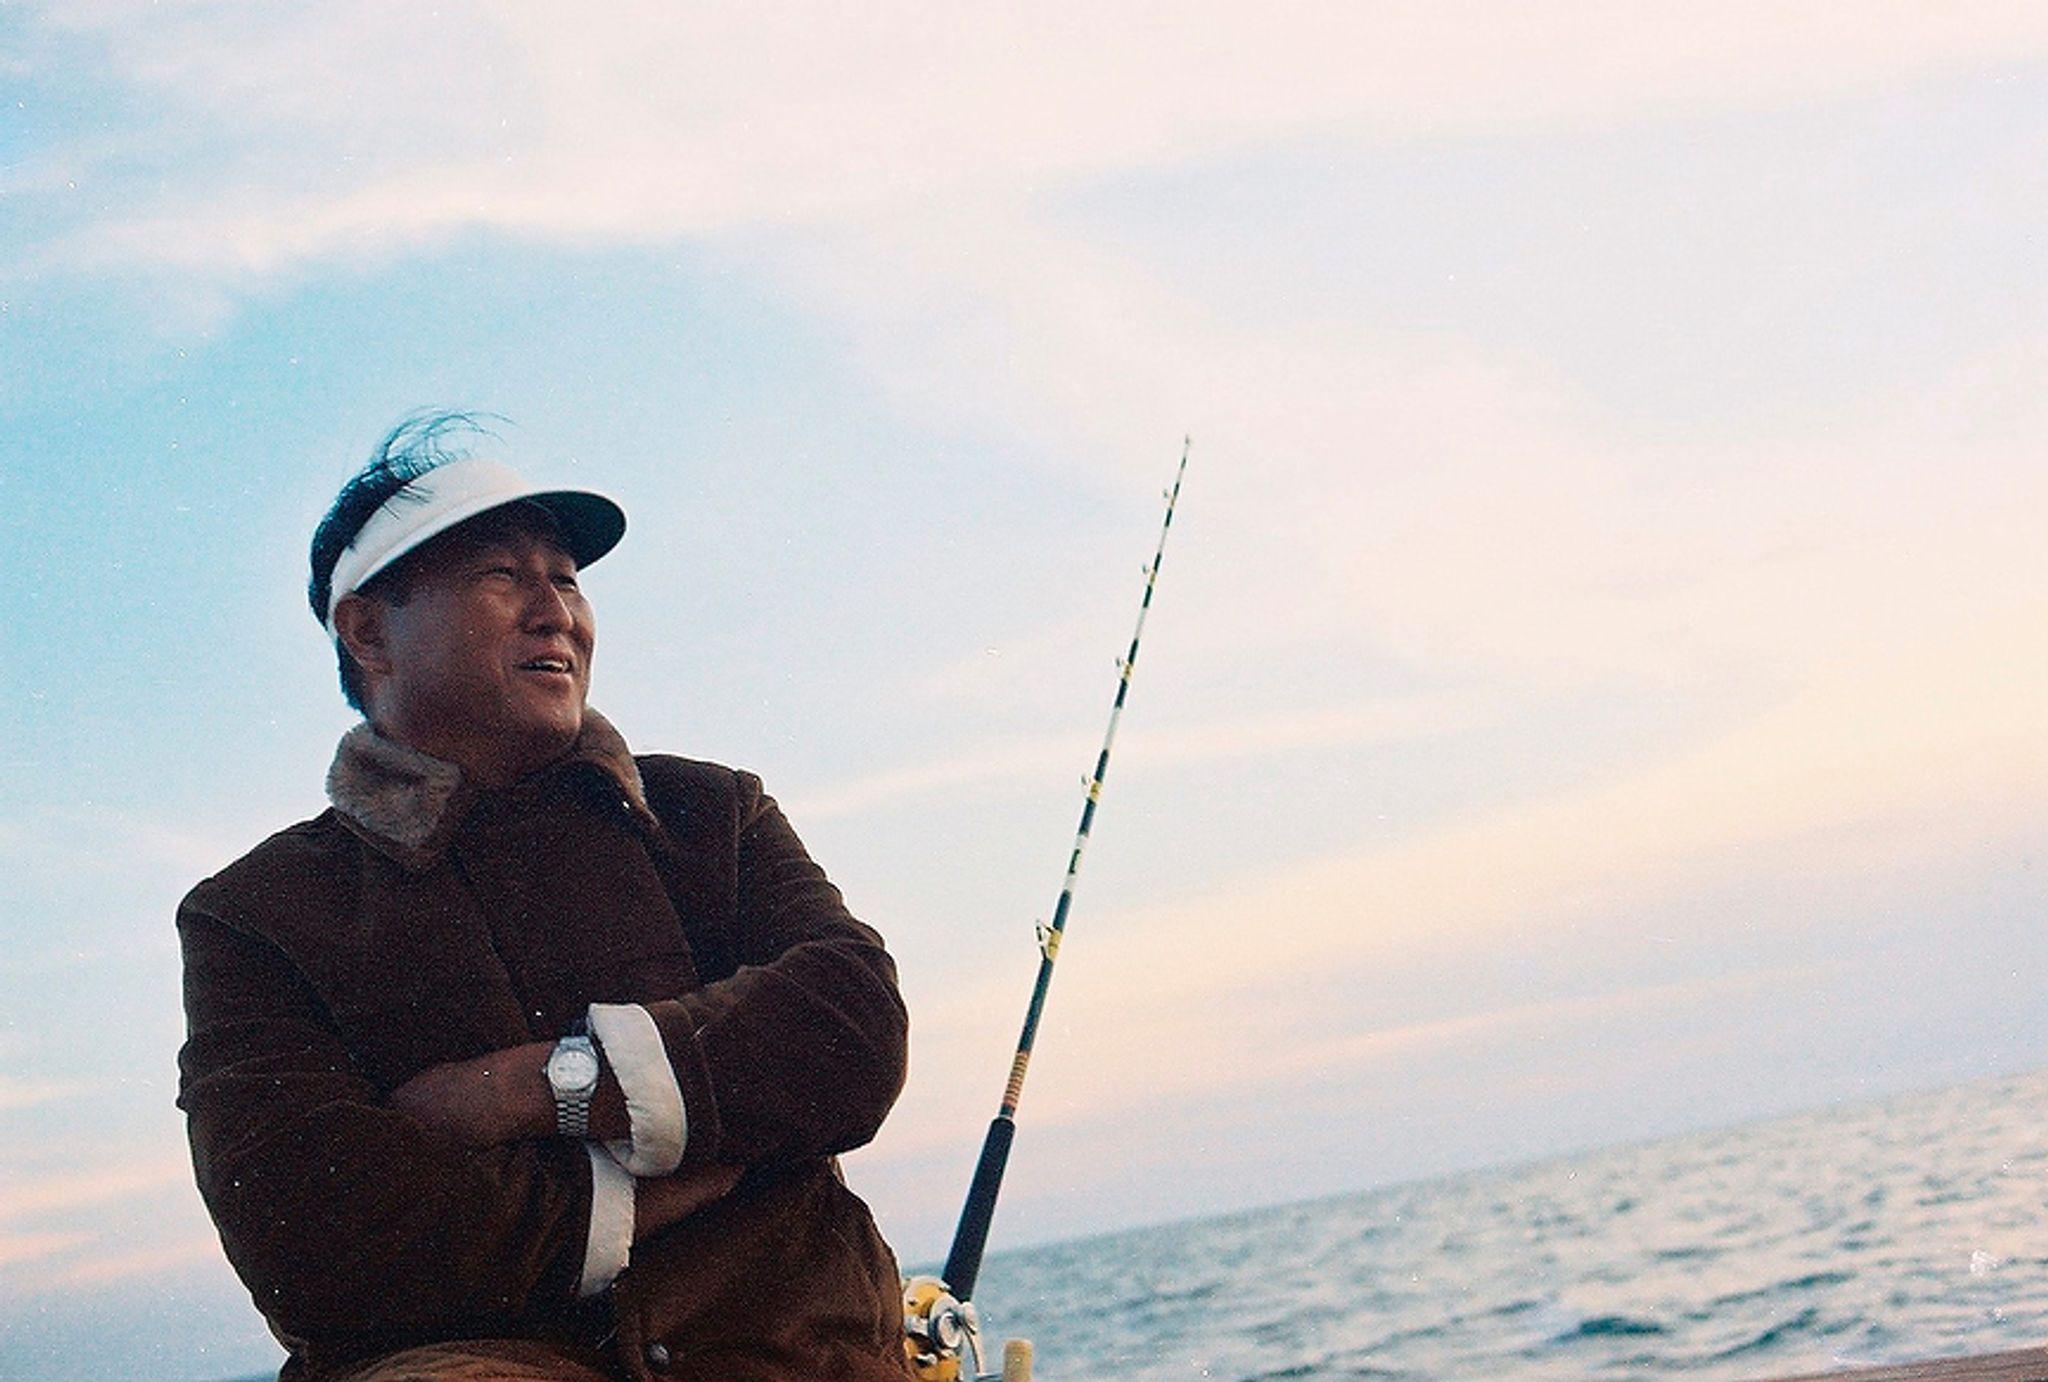 Sun Myung Moon Fishing